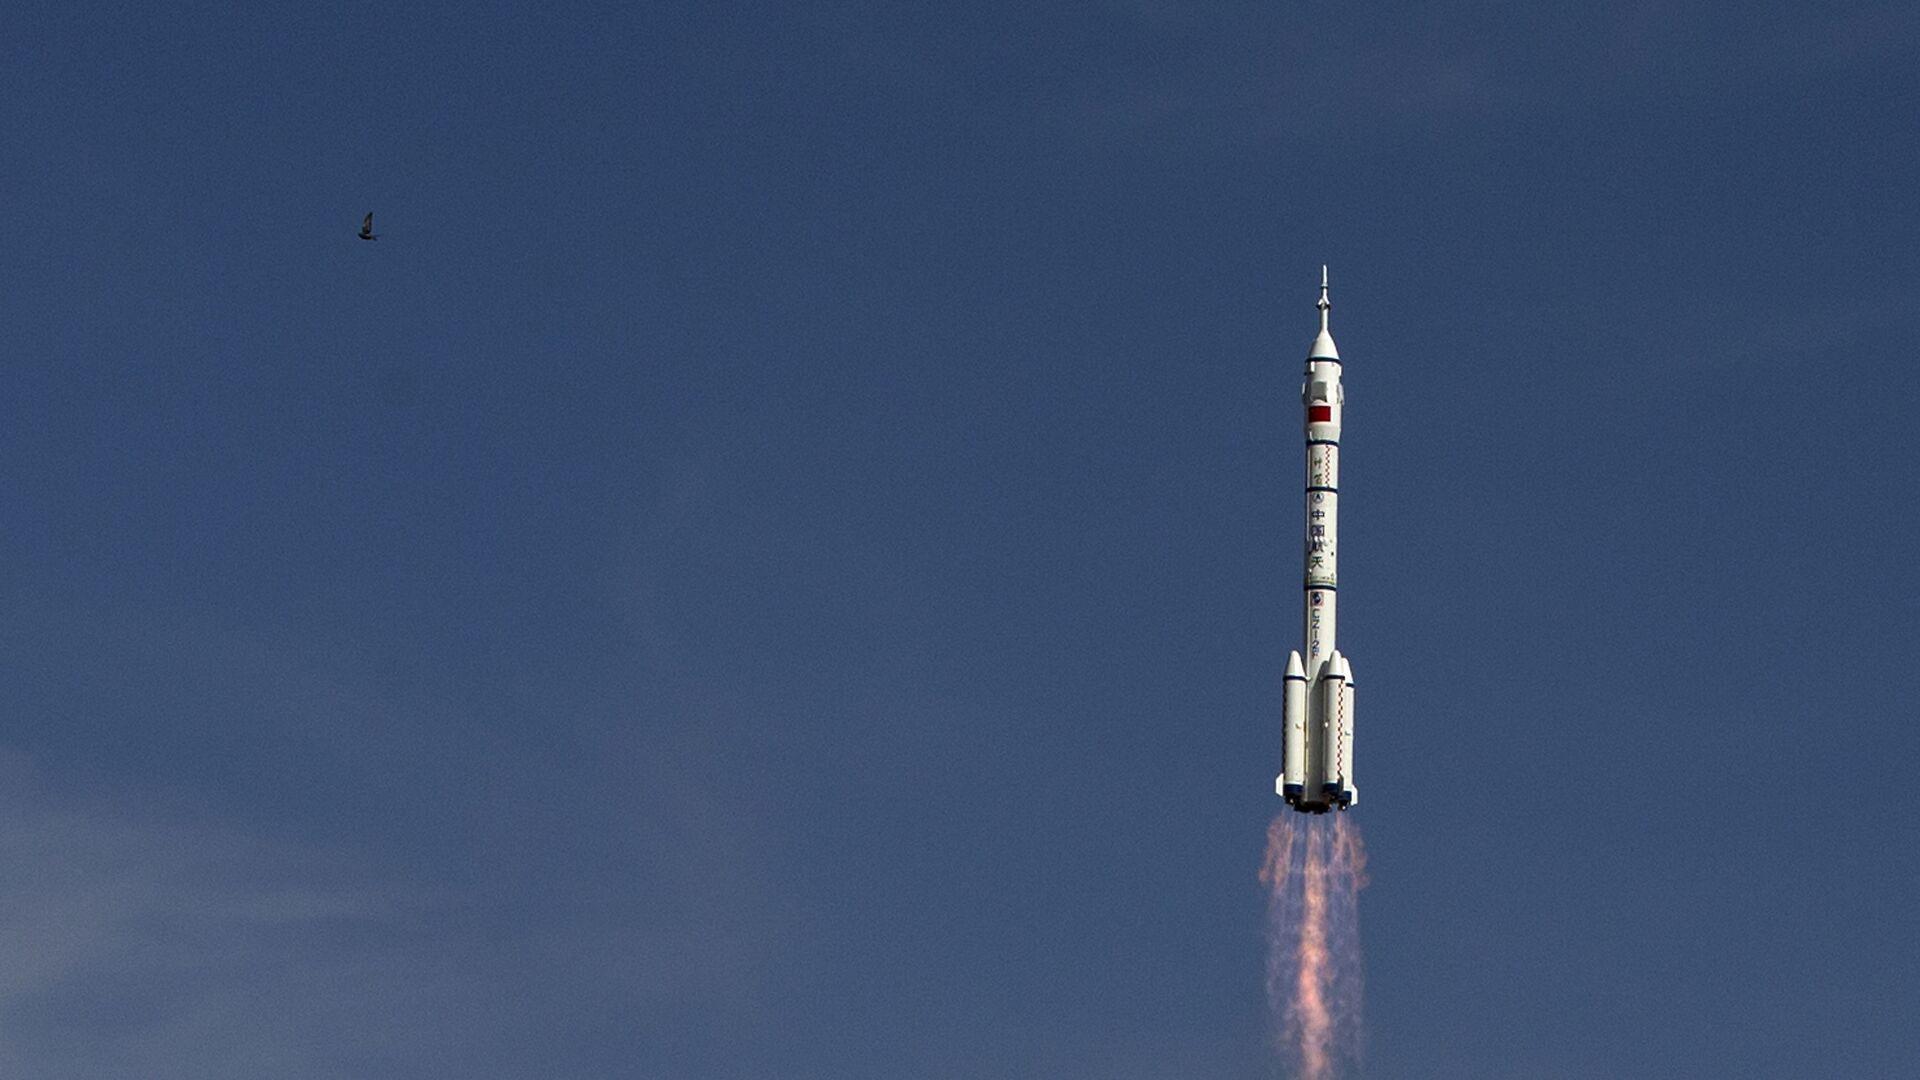 Старт ракеты-носителя Чанчжэн-2F c космодрома Цзюцюань, КНР. Архивное фото - Sputnik Italia, 1920, 16.06.2021